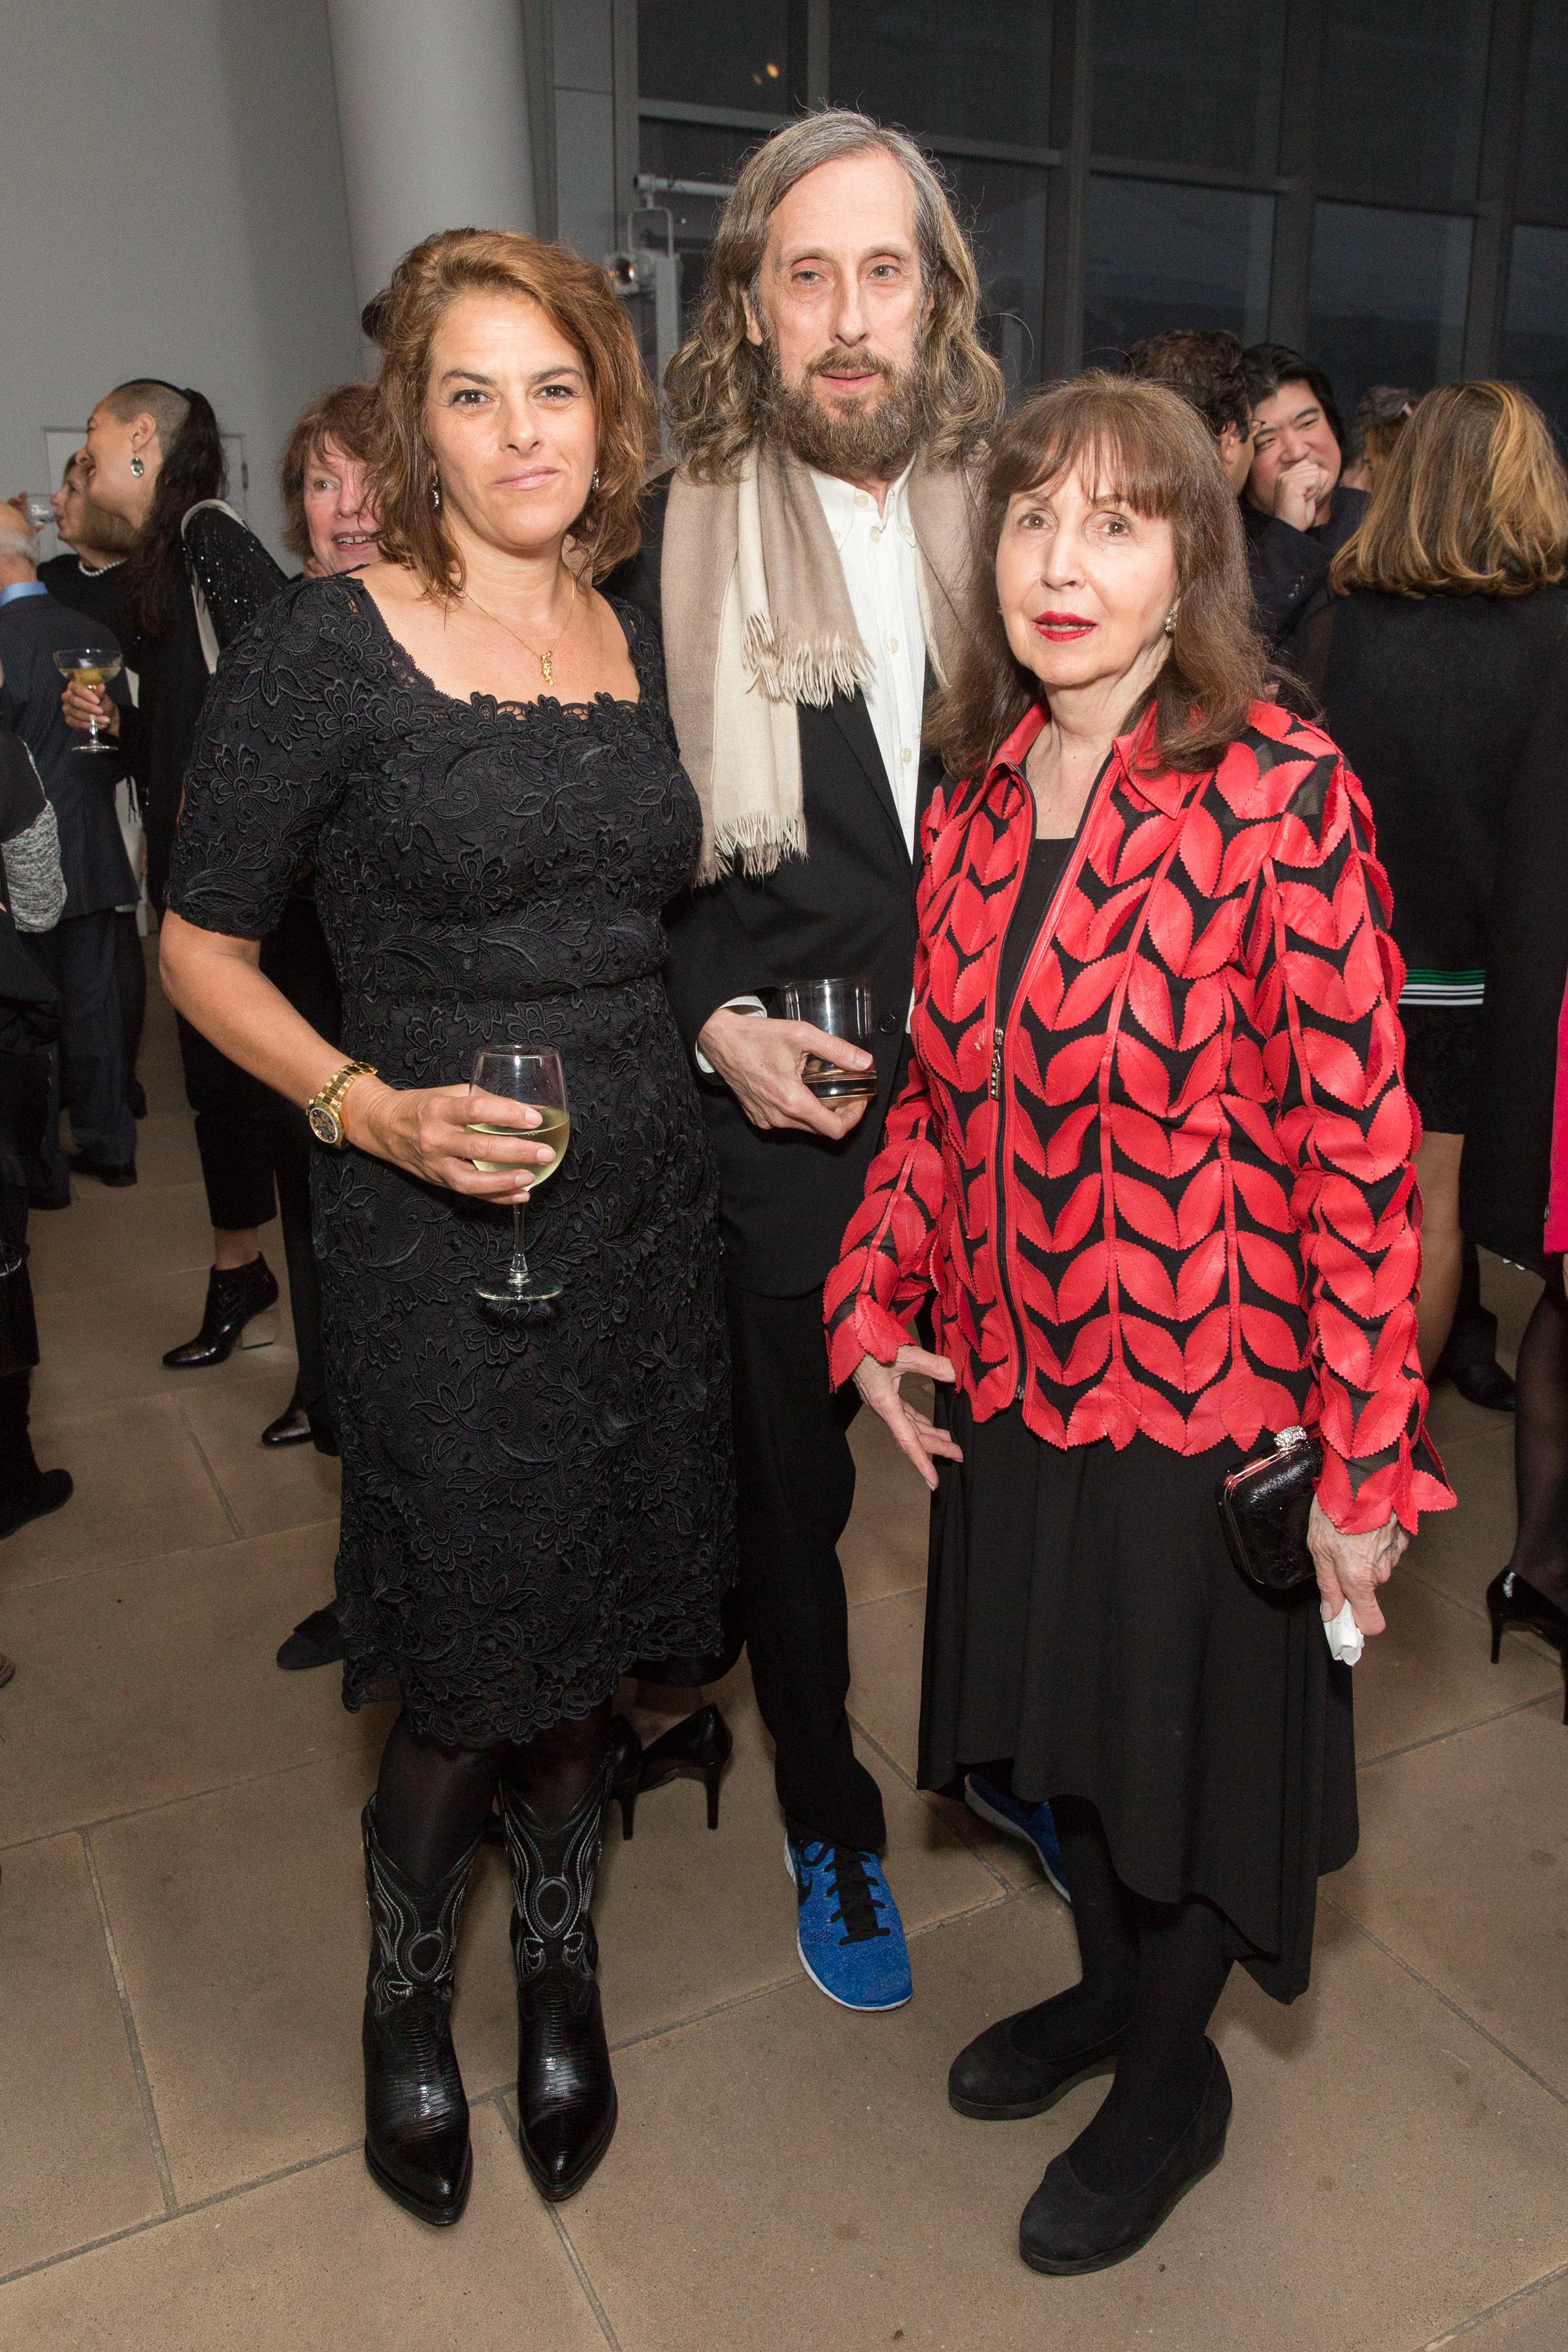 Tracey Emin, Jerry Gorovoy and Lois Plehn.jpg